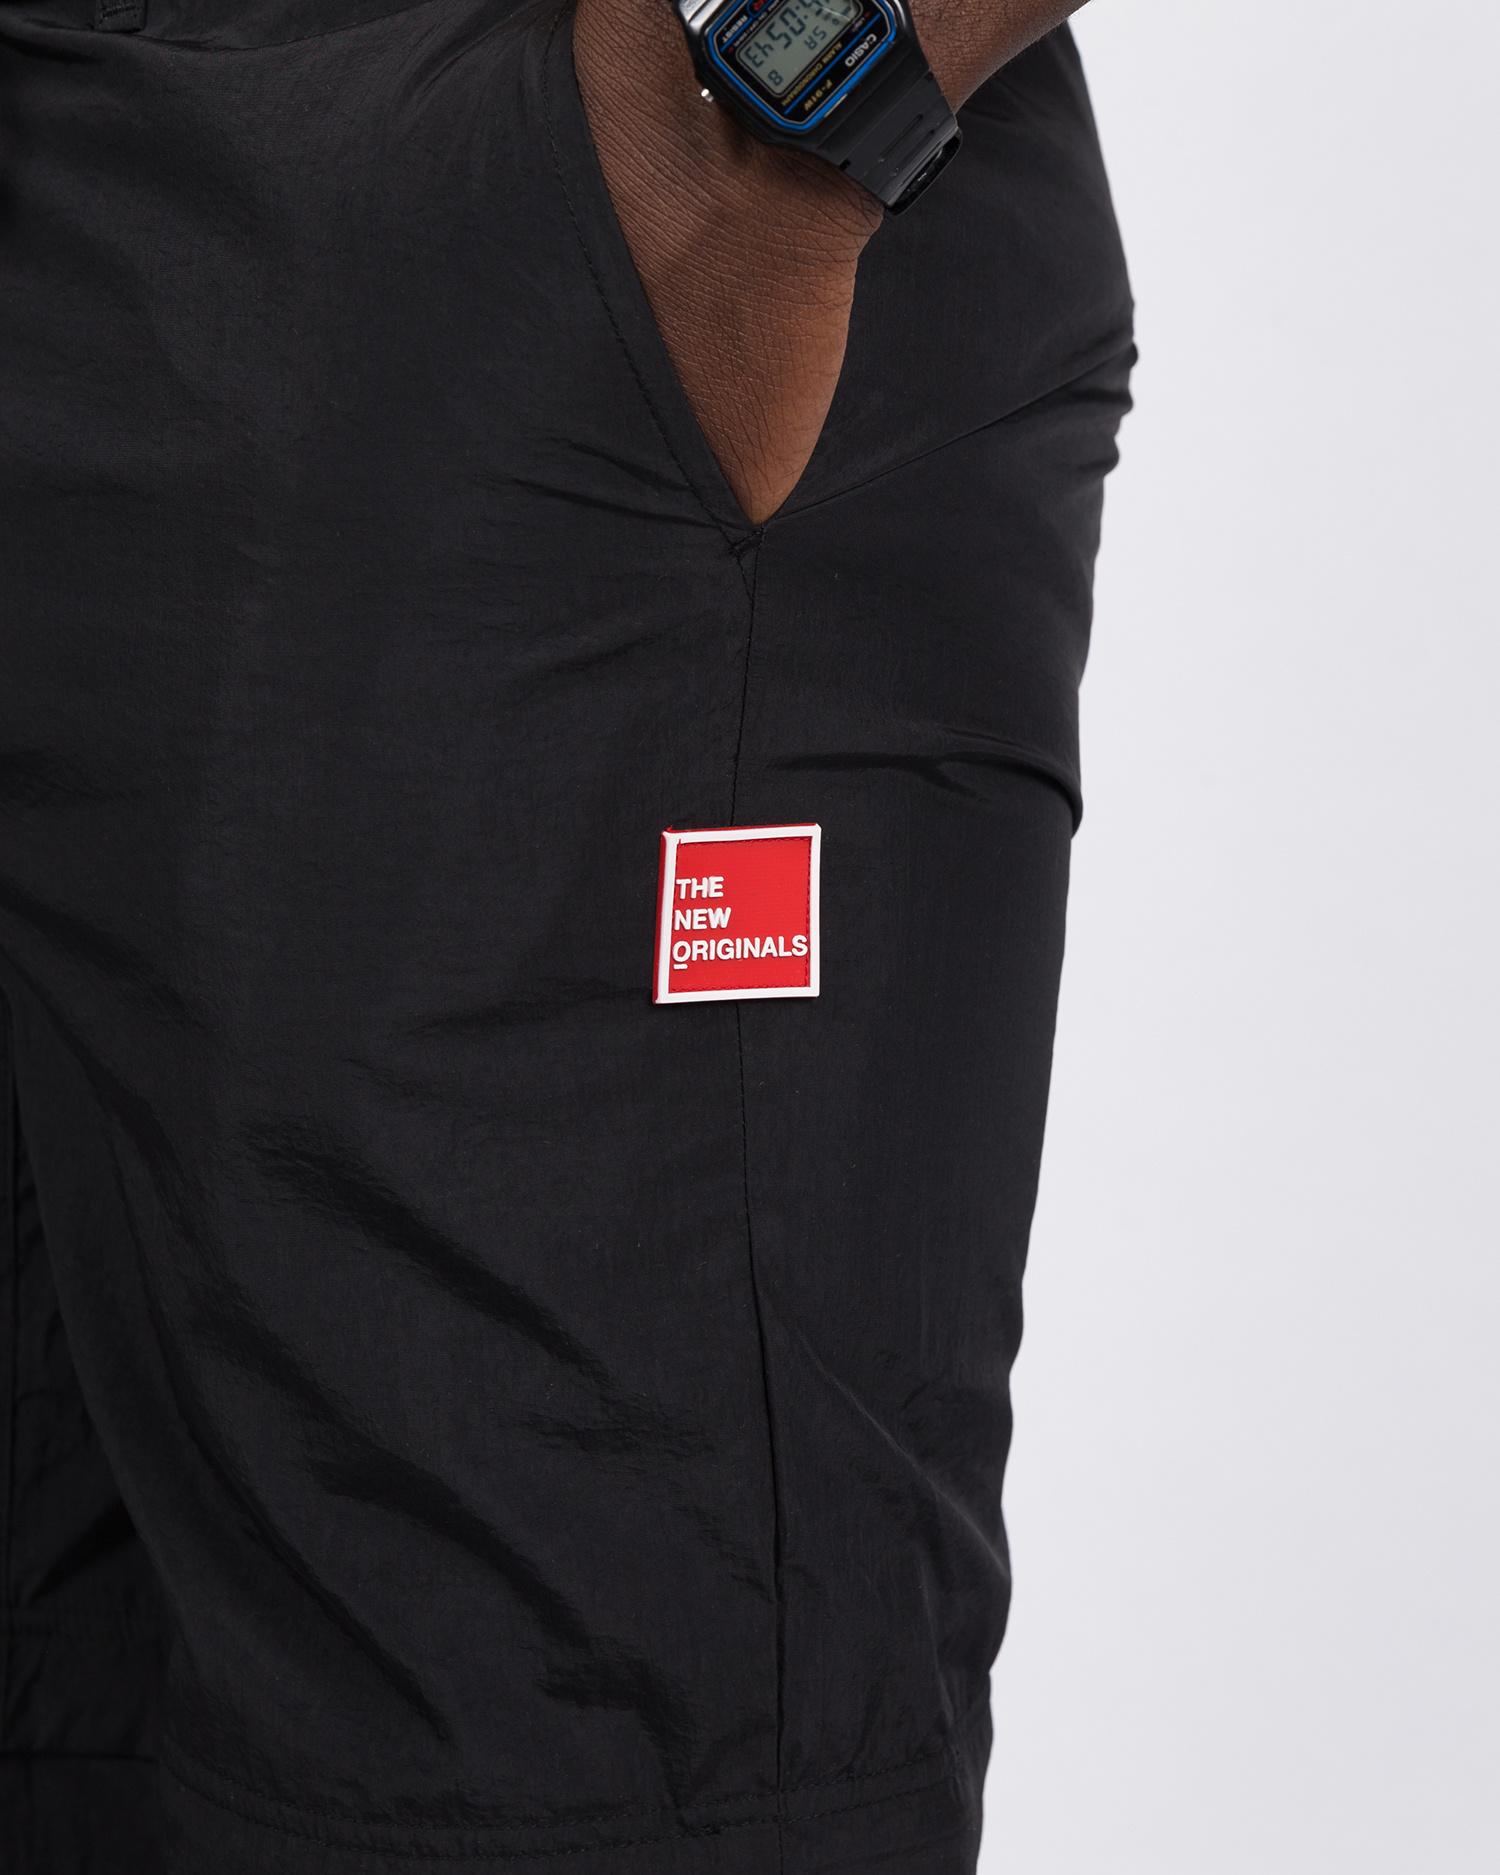 The New Originals Parachute Trousers 2.0 Black